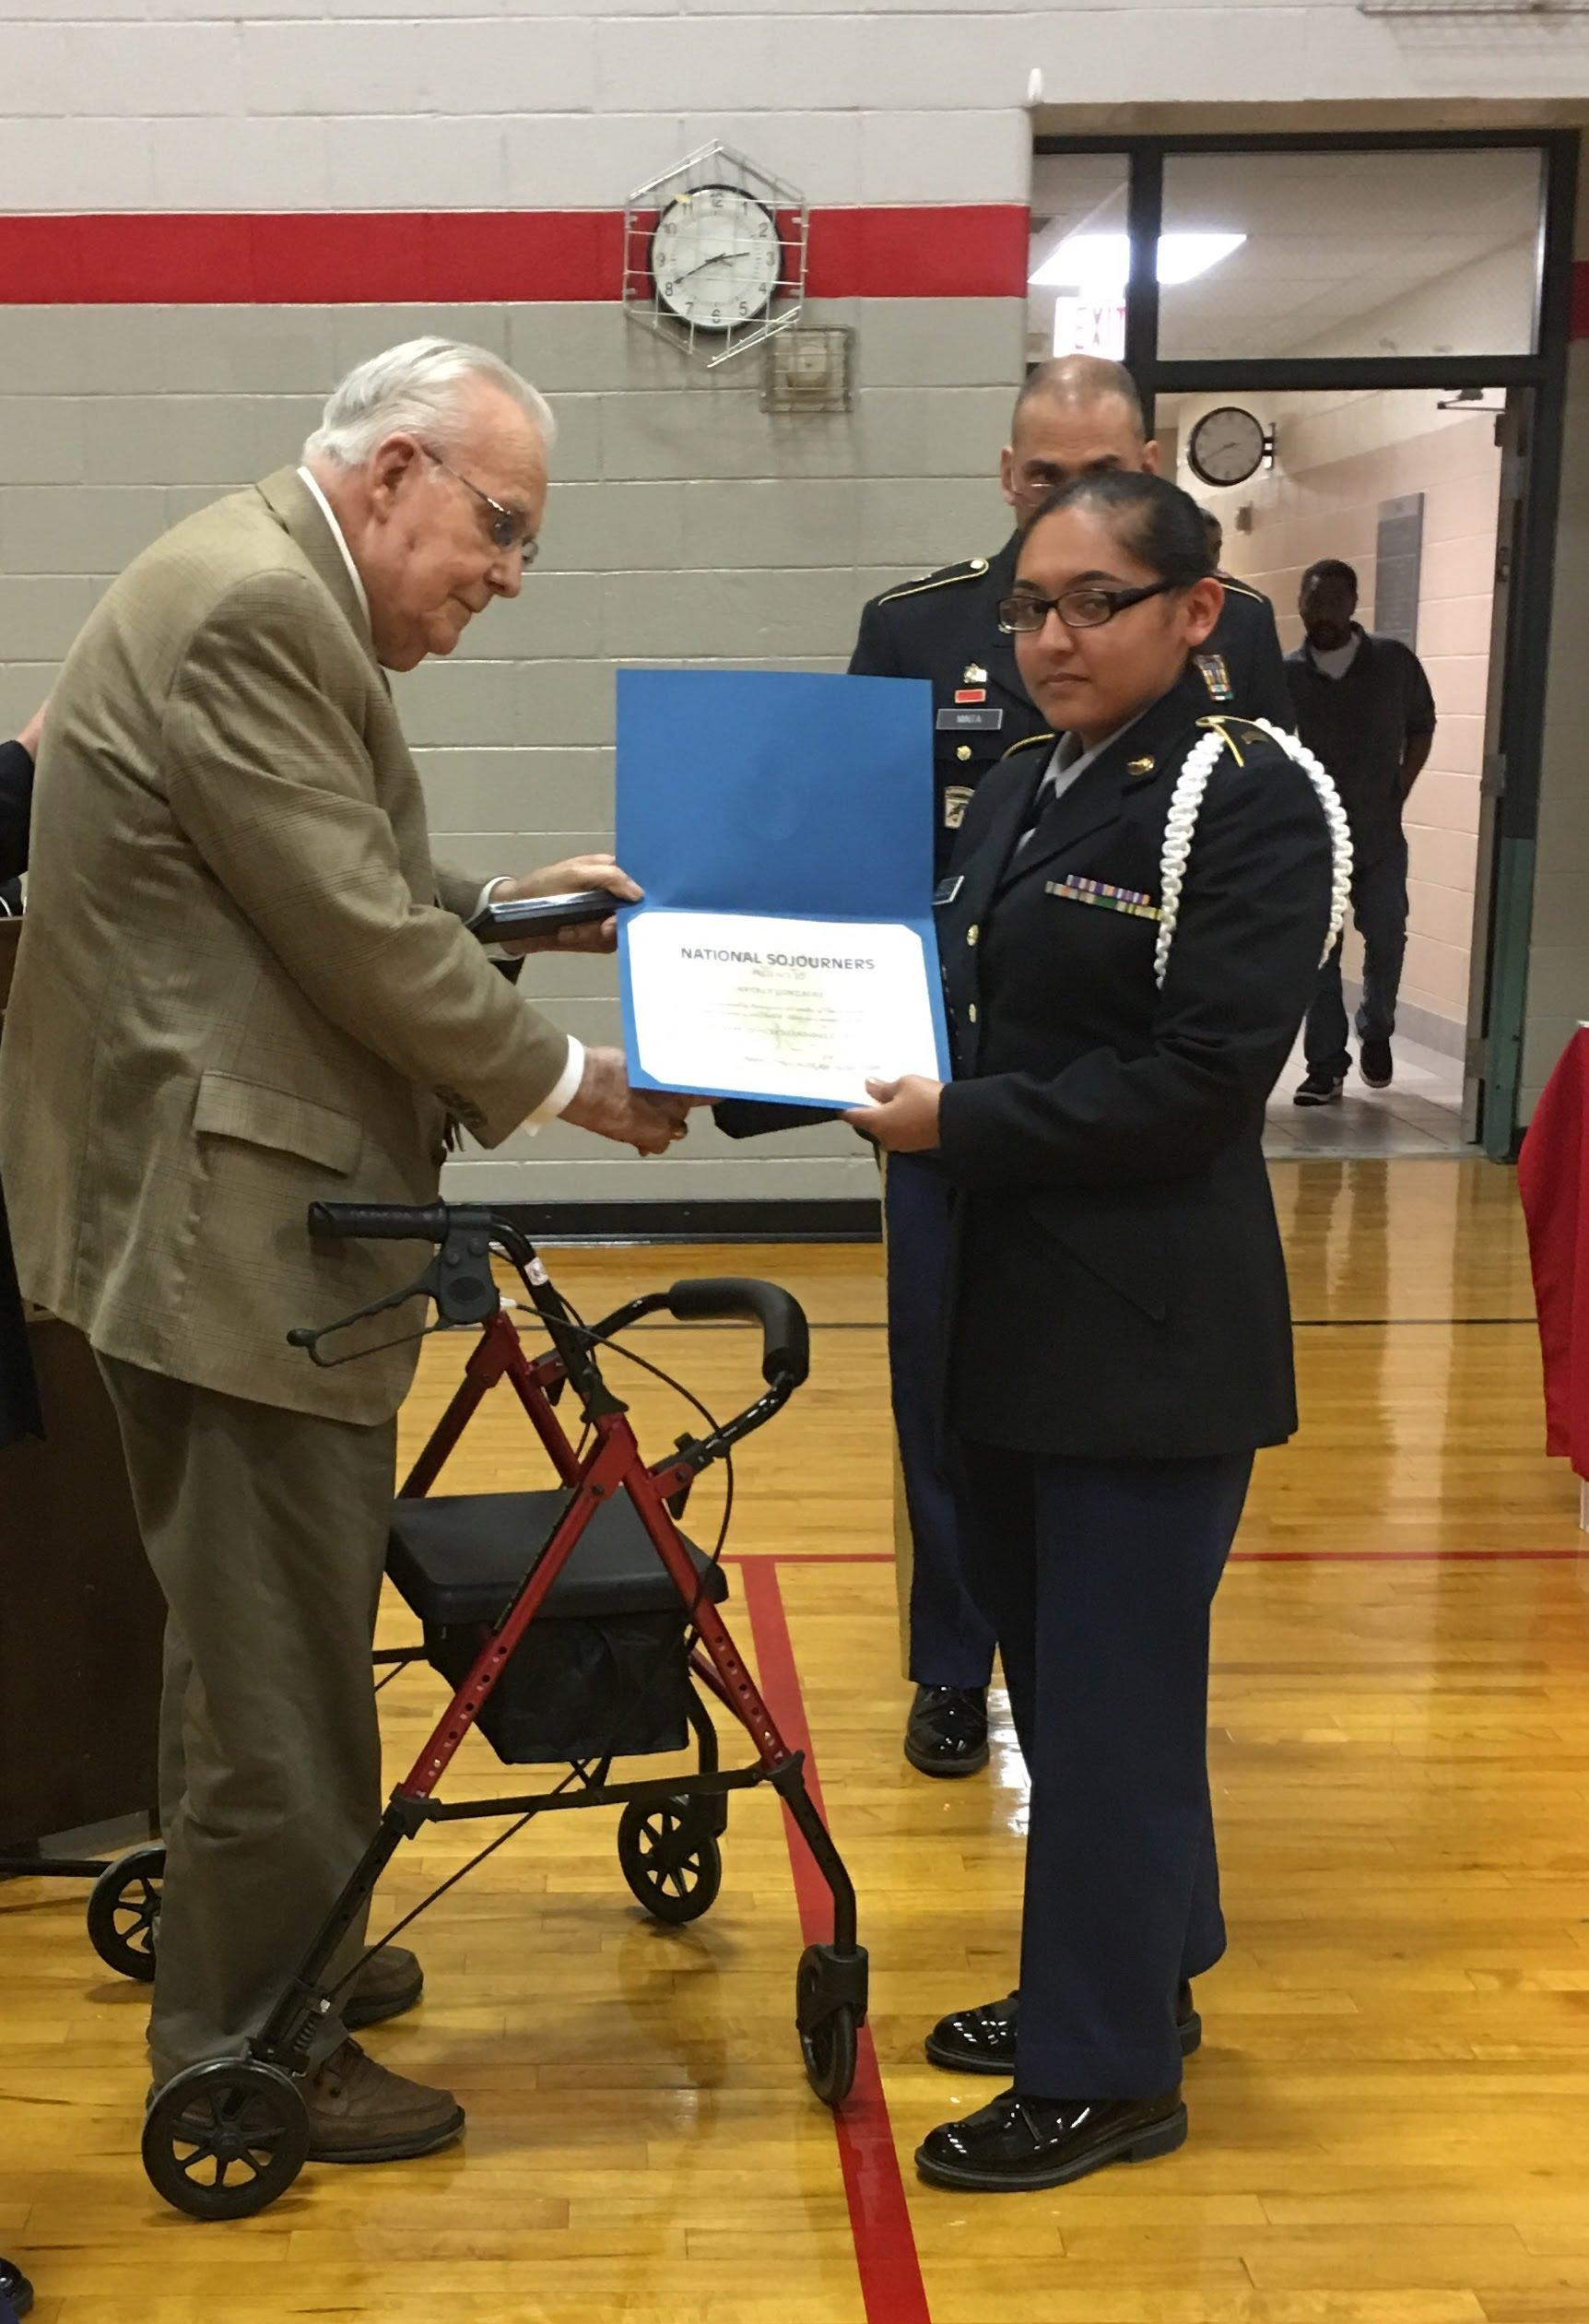 WW II Veteran & POW presents JROTC Award